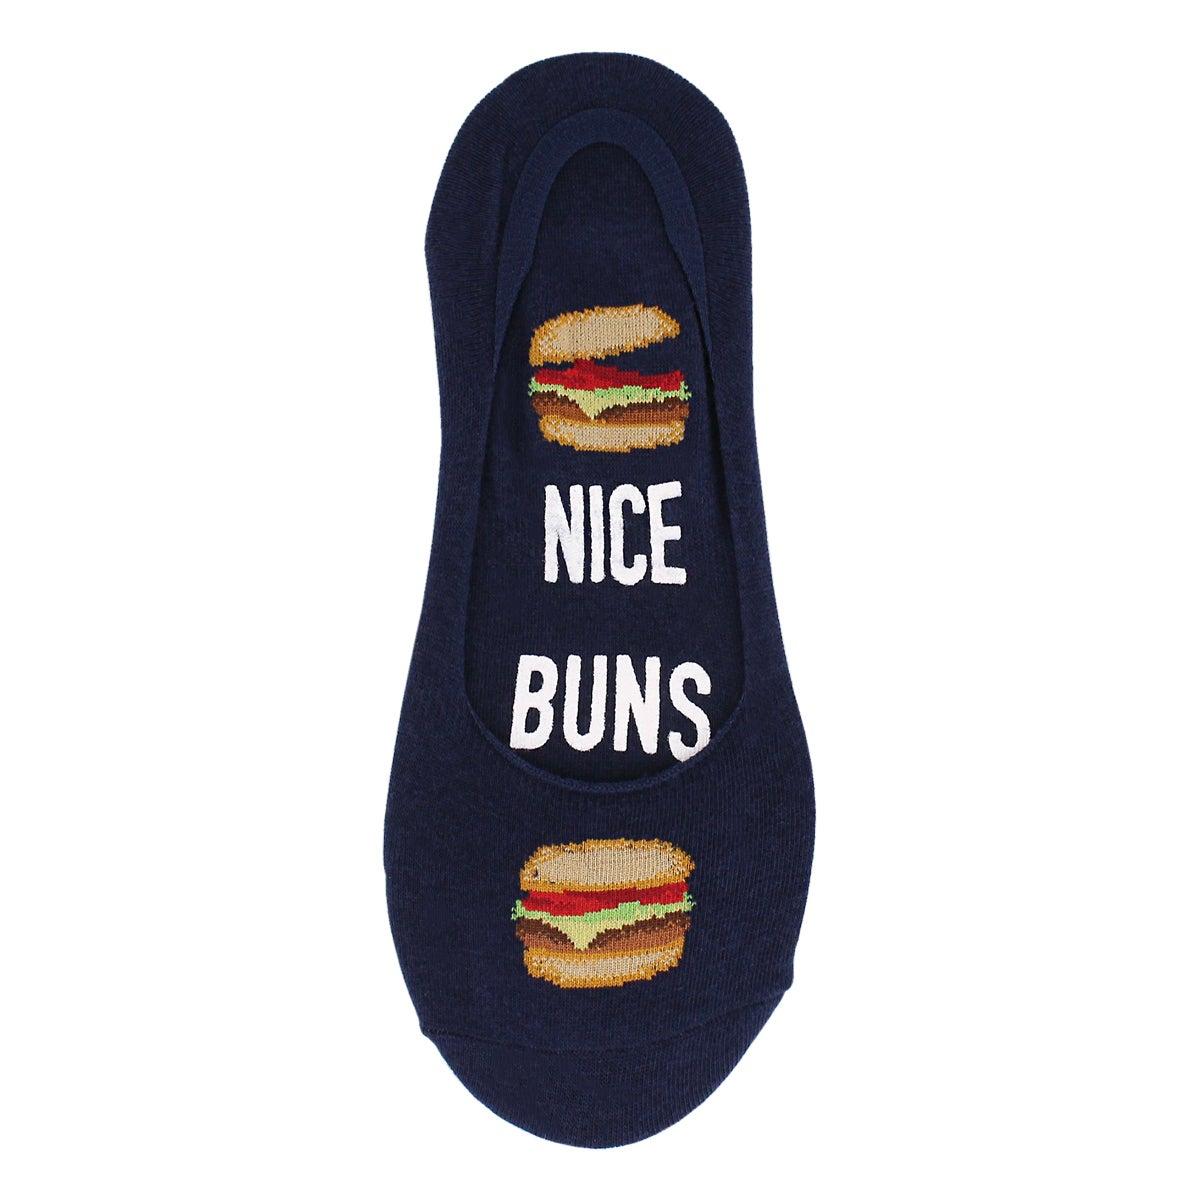 Men's NICE BUNS navy liner socks